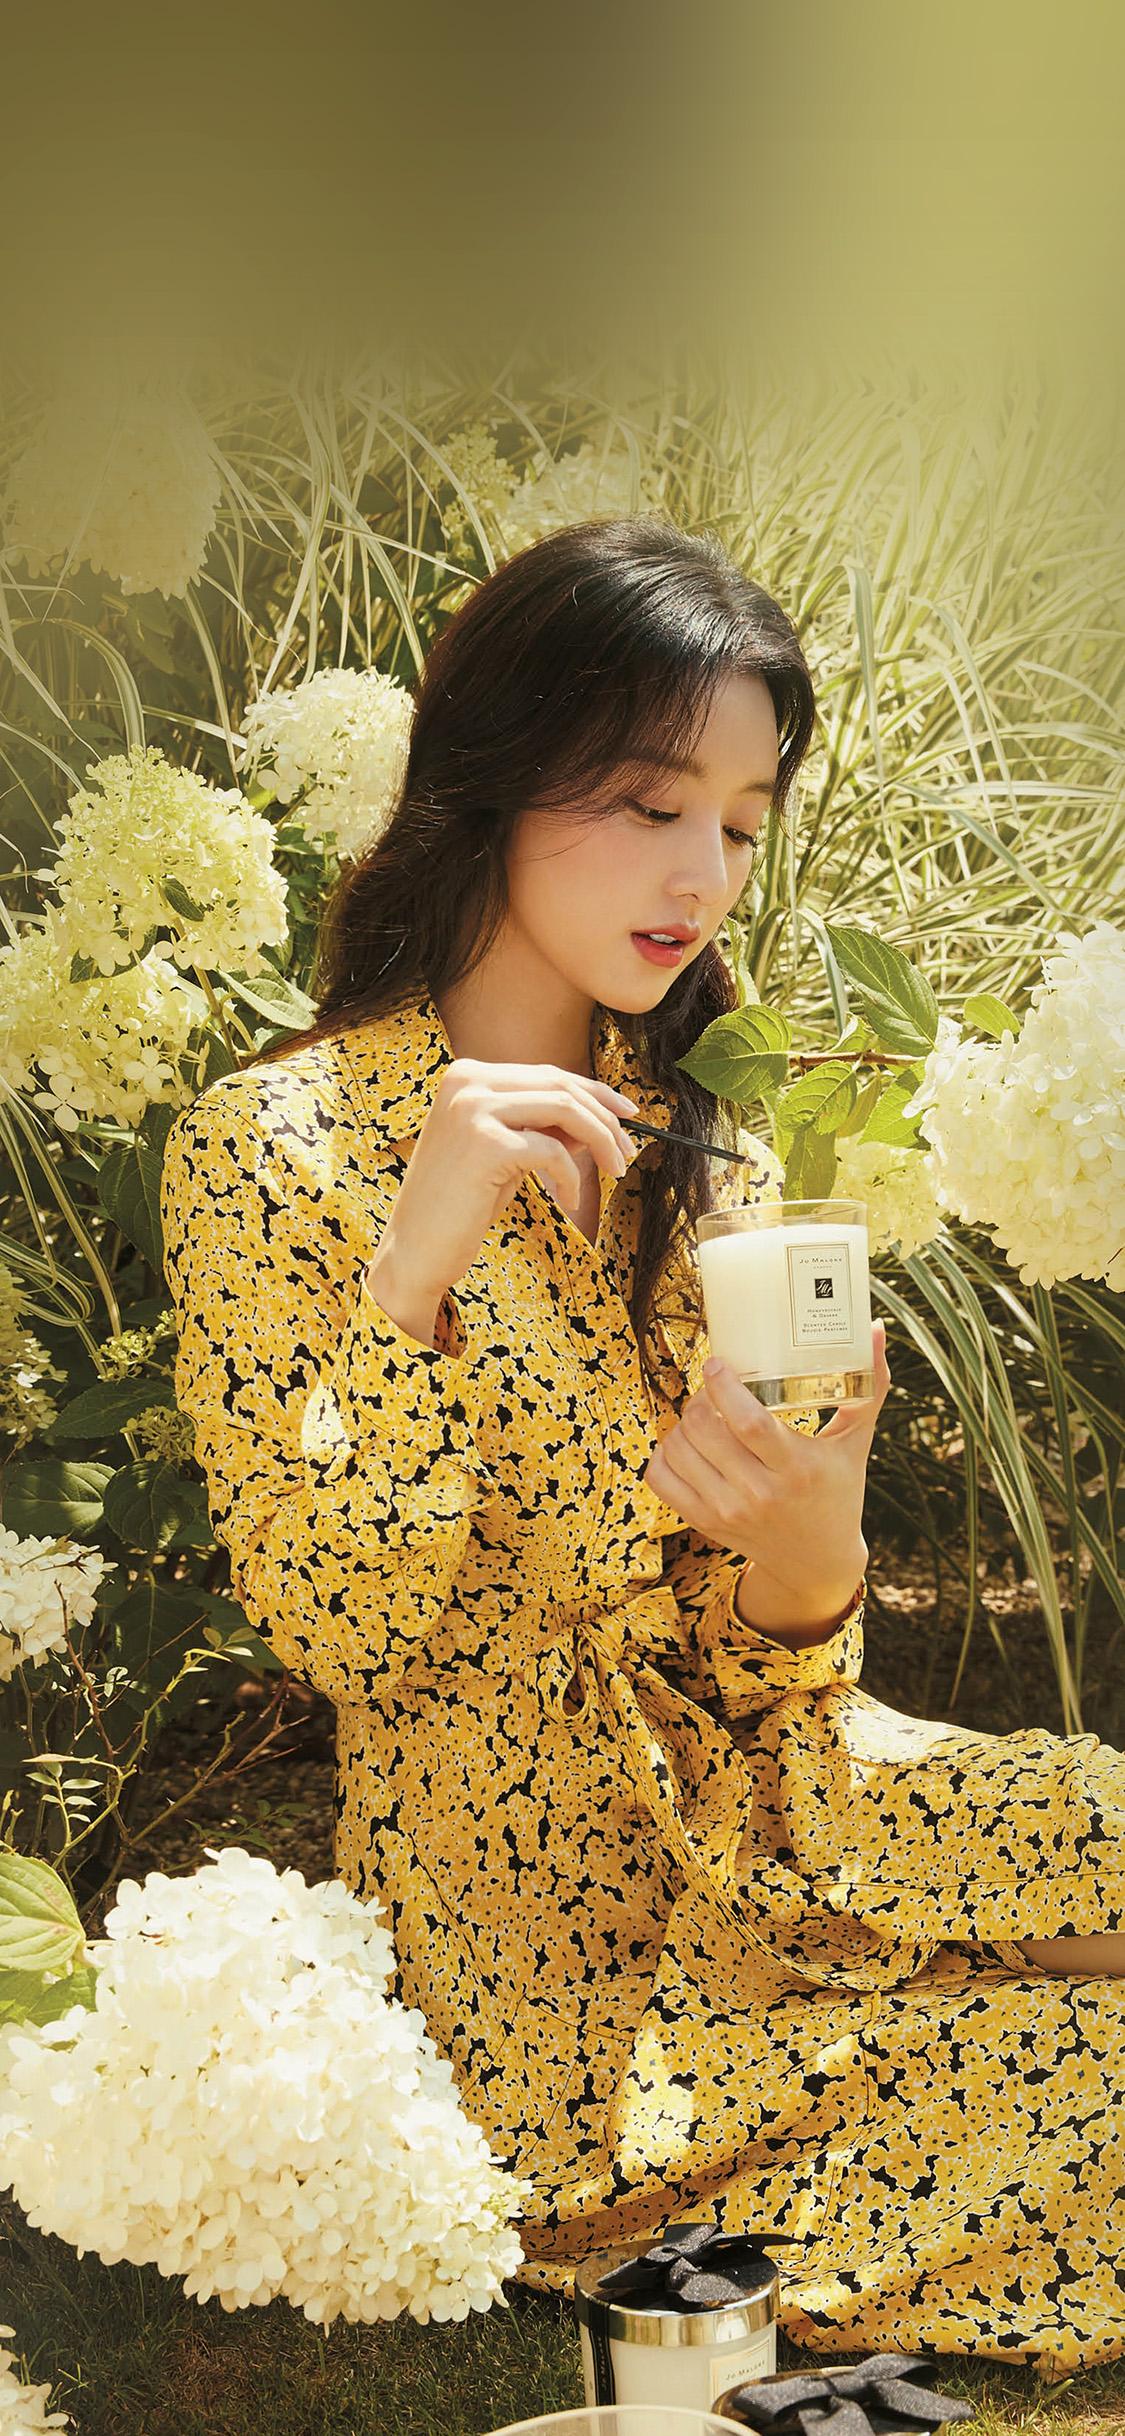 iPhonexpapers.com-Apple-iPhone-wallpaper-hr16-kpop-girl-yellow-spring-flower-jiwon